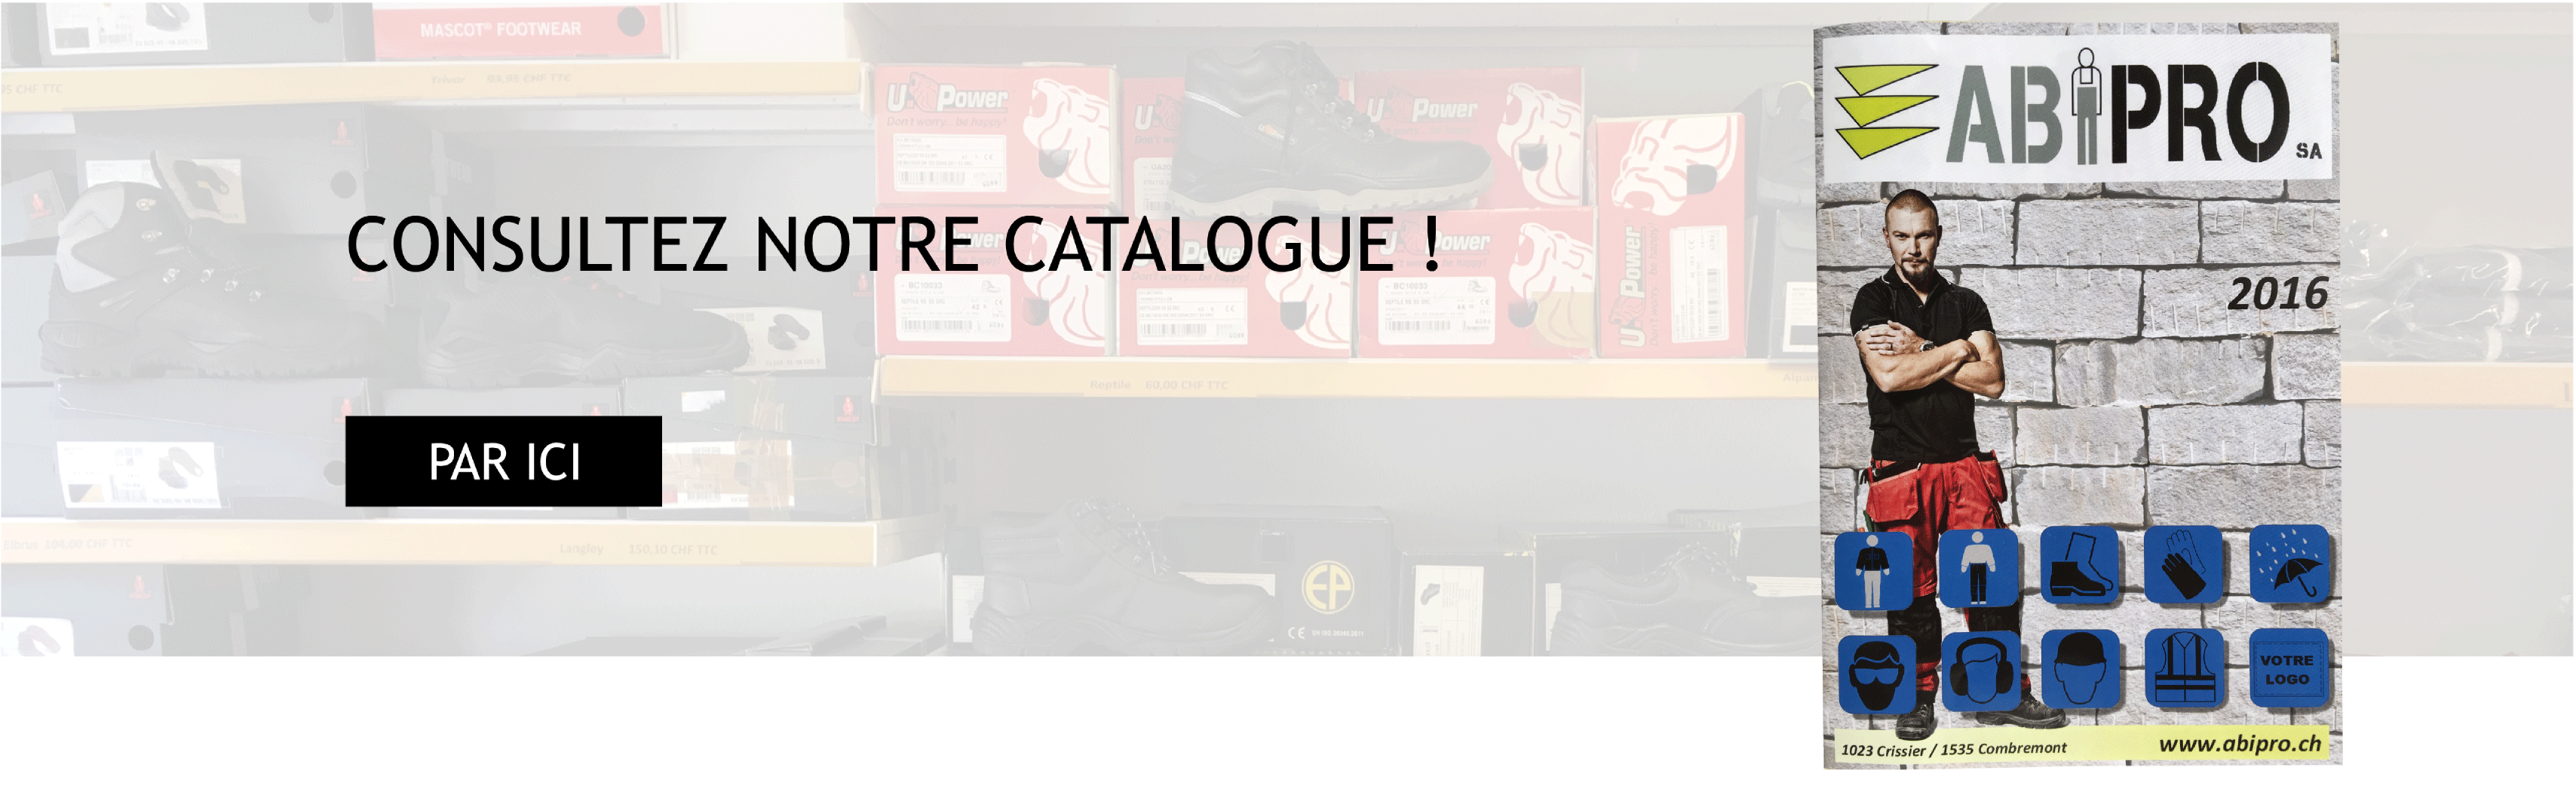 slide_catologue